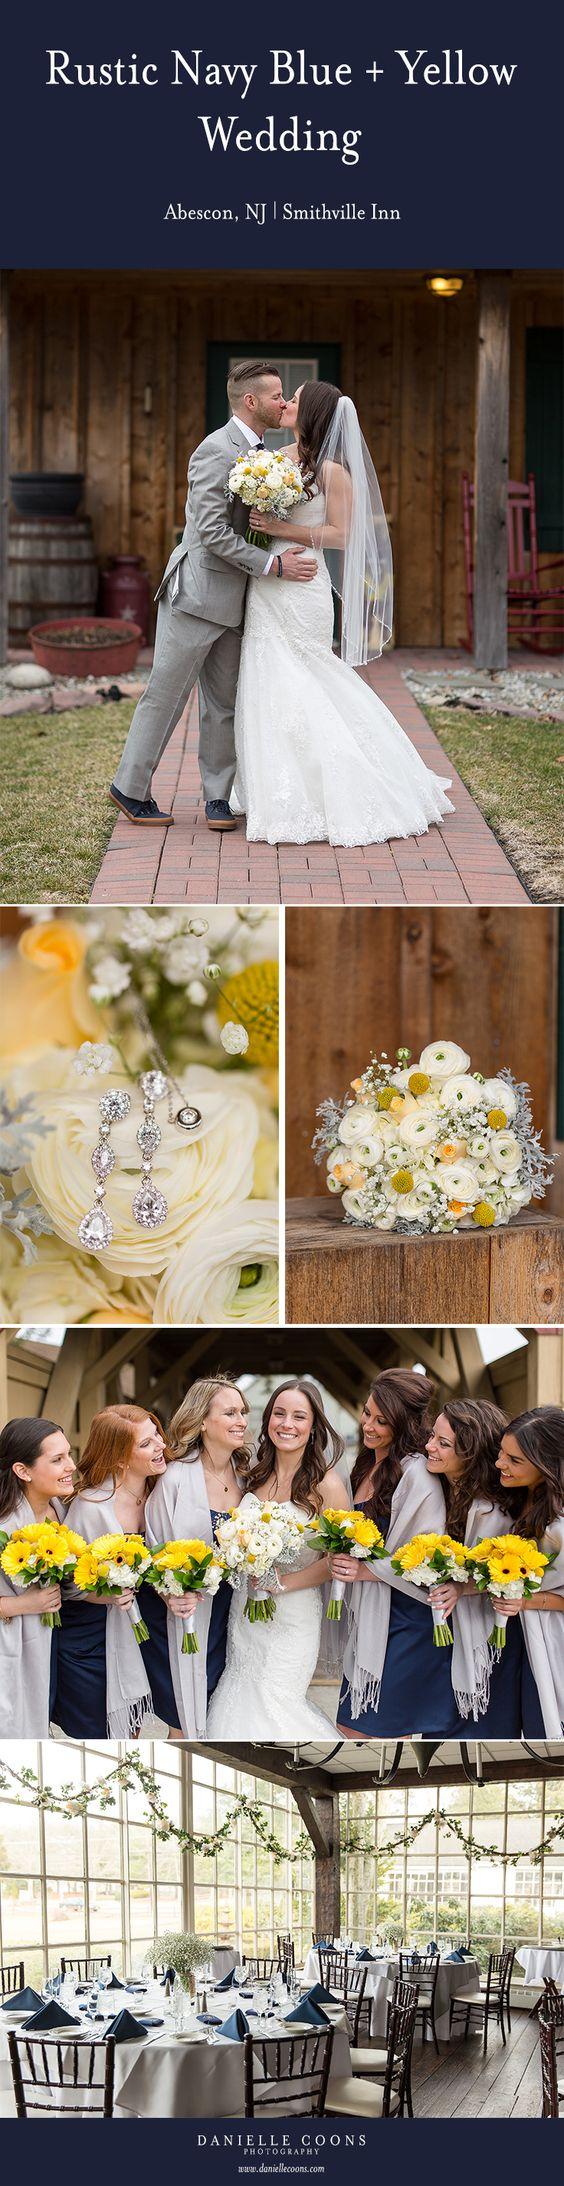 Rustic Navy Blue + Yellow Wedding | Abescon, NJ | Smithville Inn Wedding